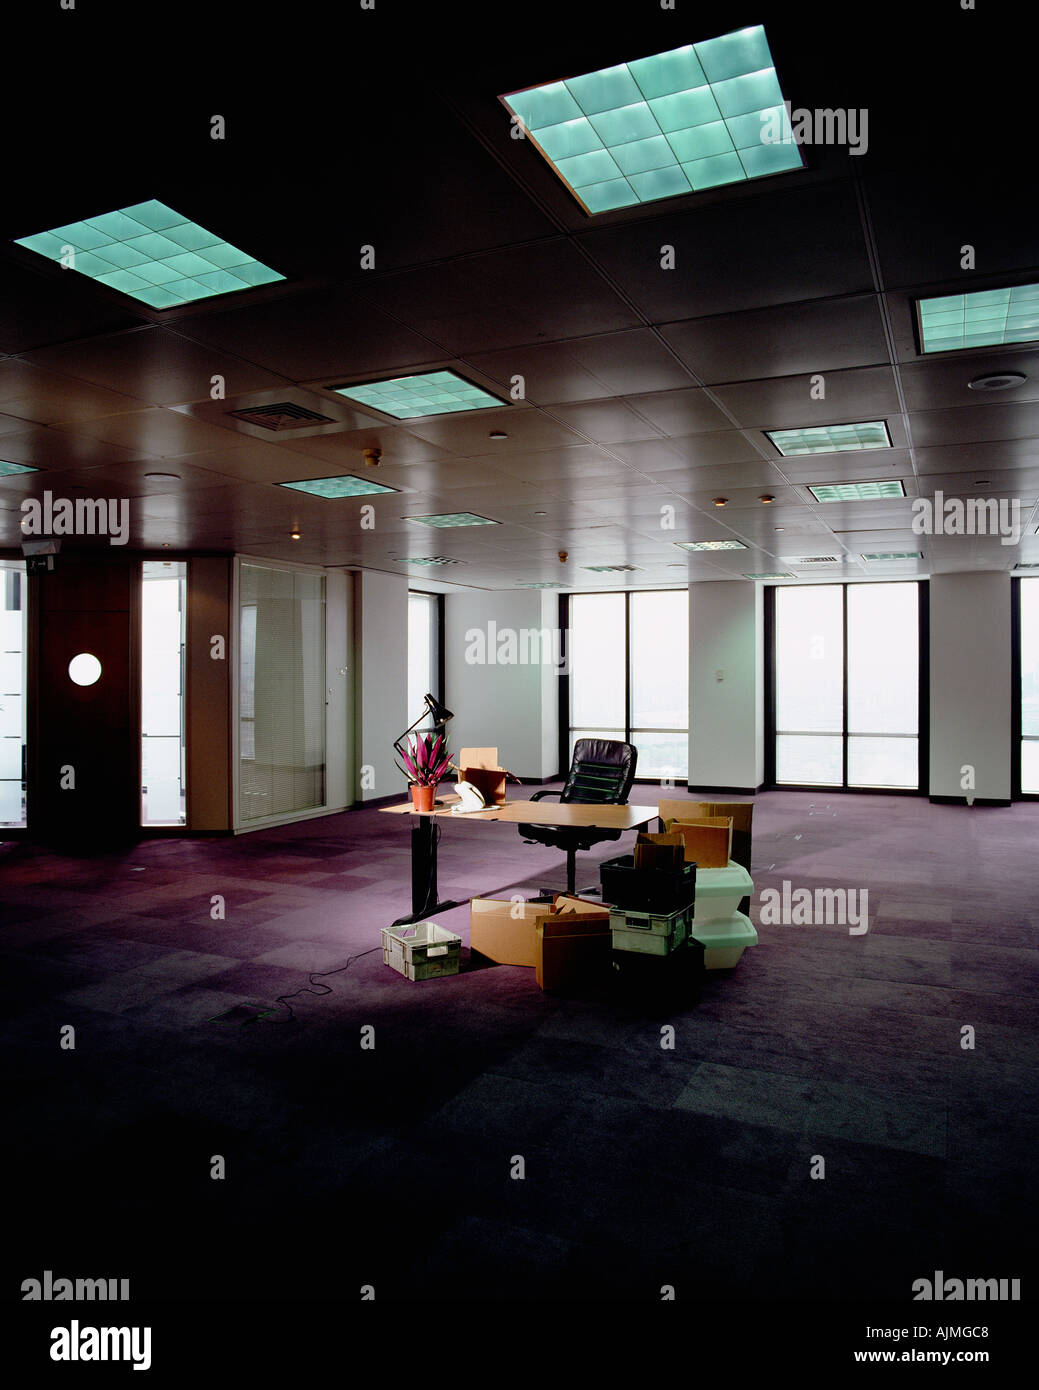 Messy desk in empty office - Stock Image